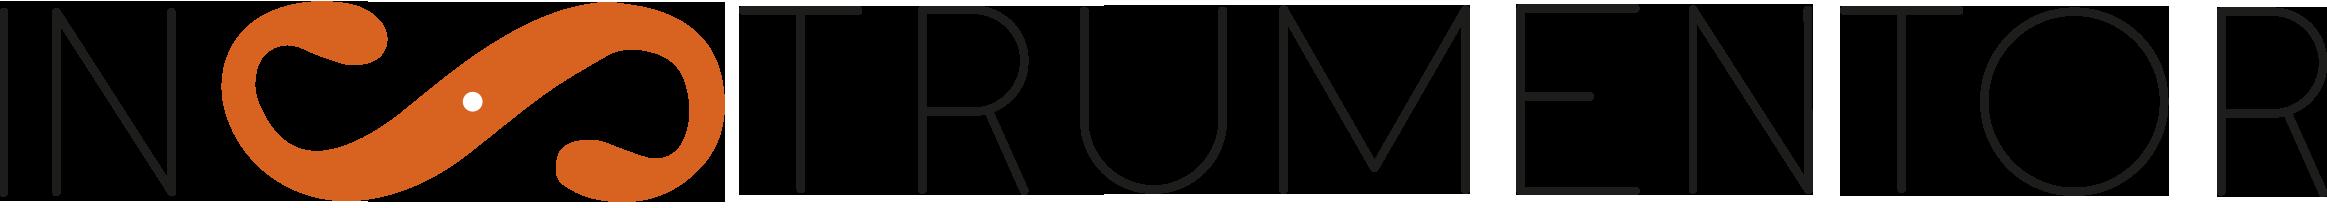 Asociația Instru-Mentor logo